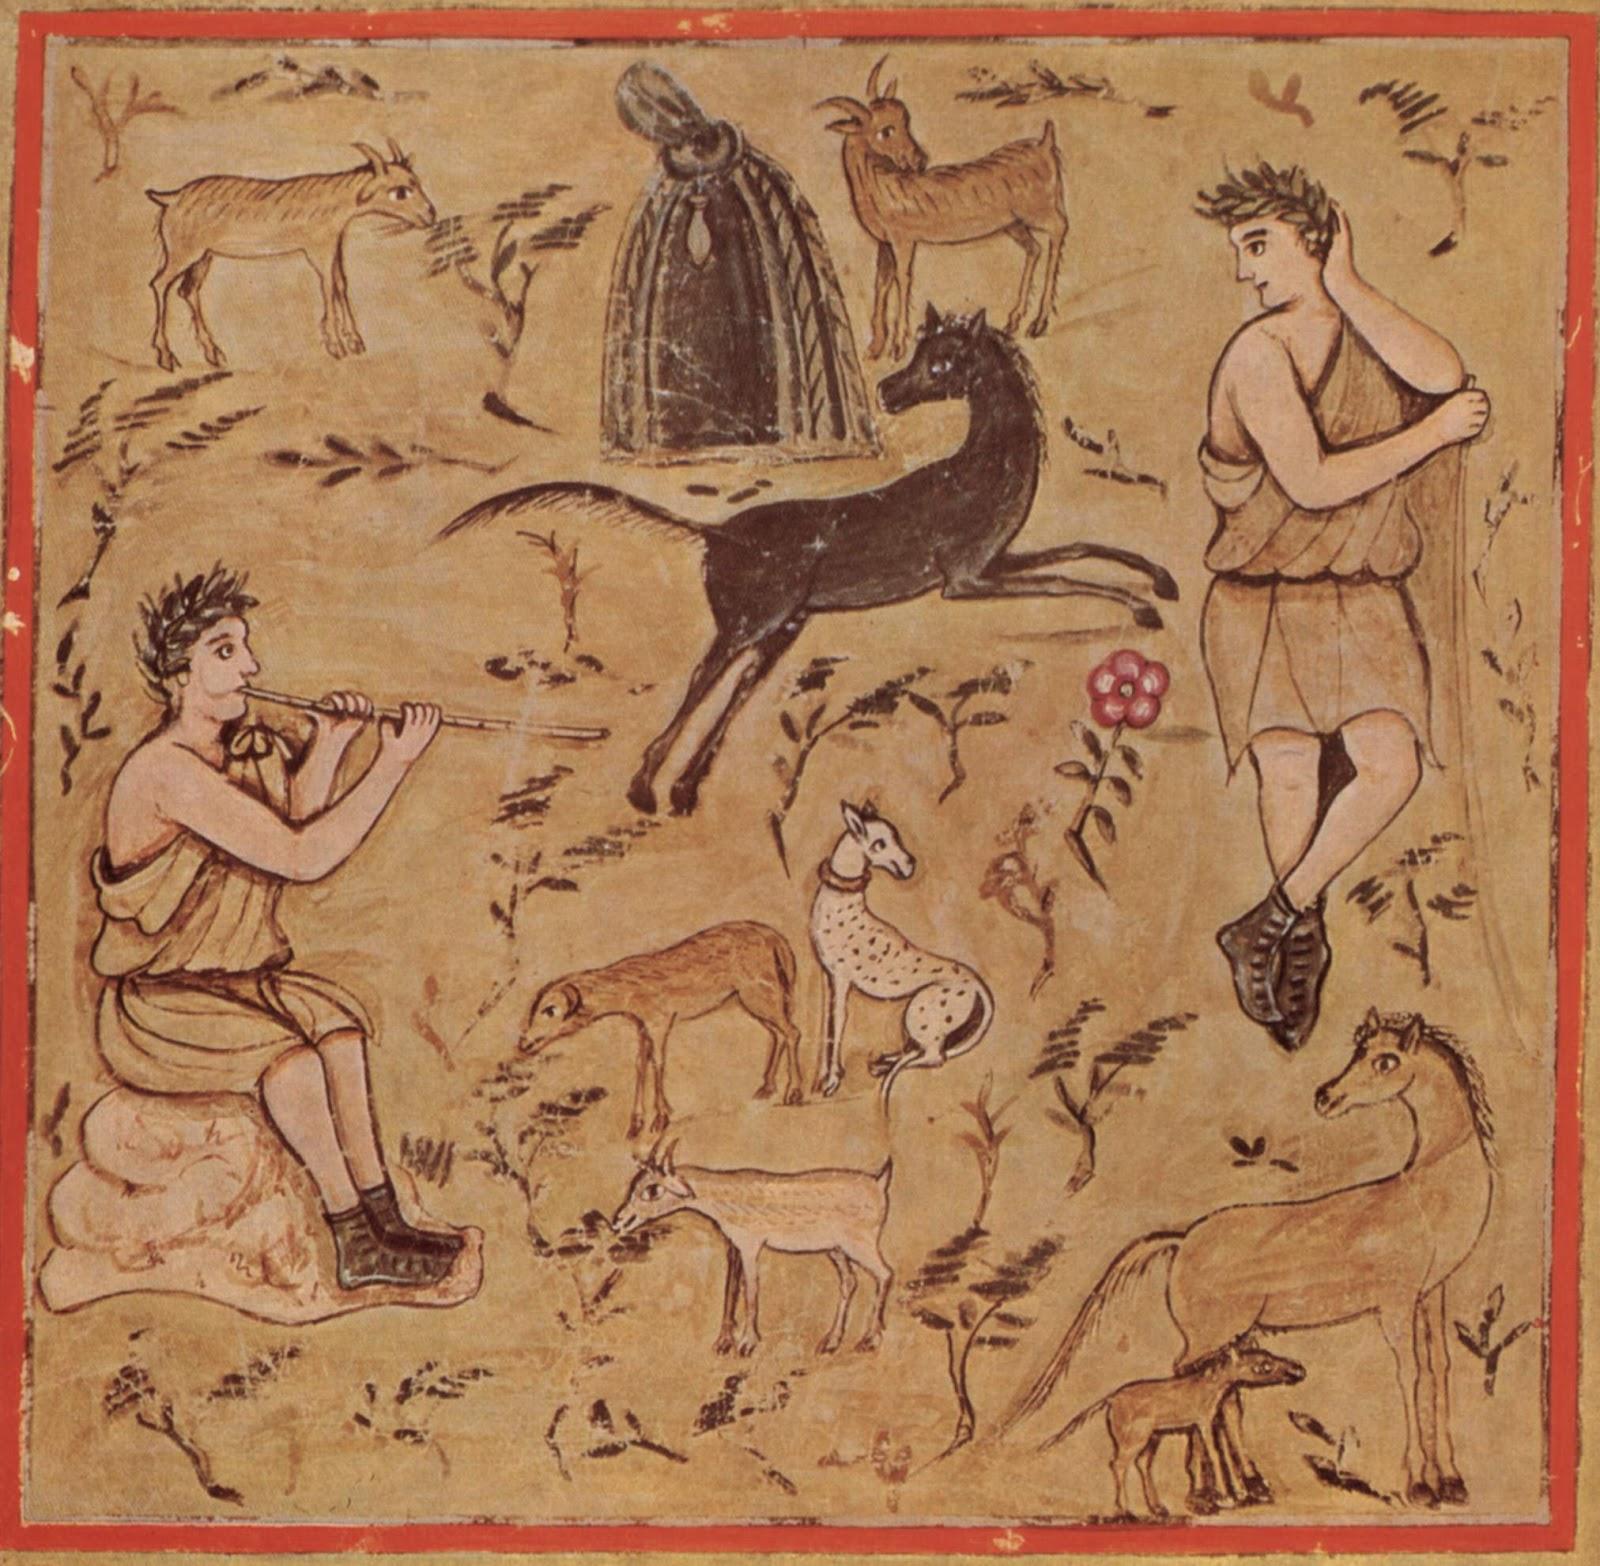 5 Meister_des_Vergilius_Romanus_shepherd flocks  vaticano.jpg